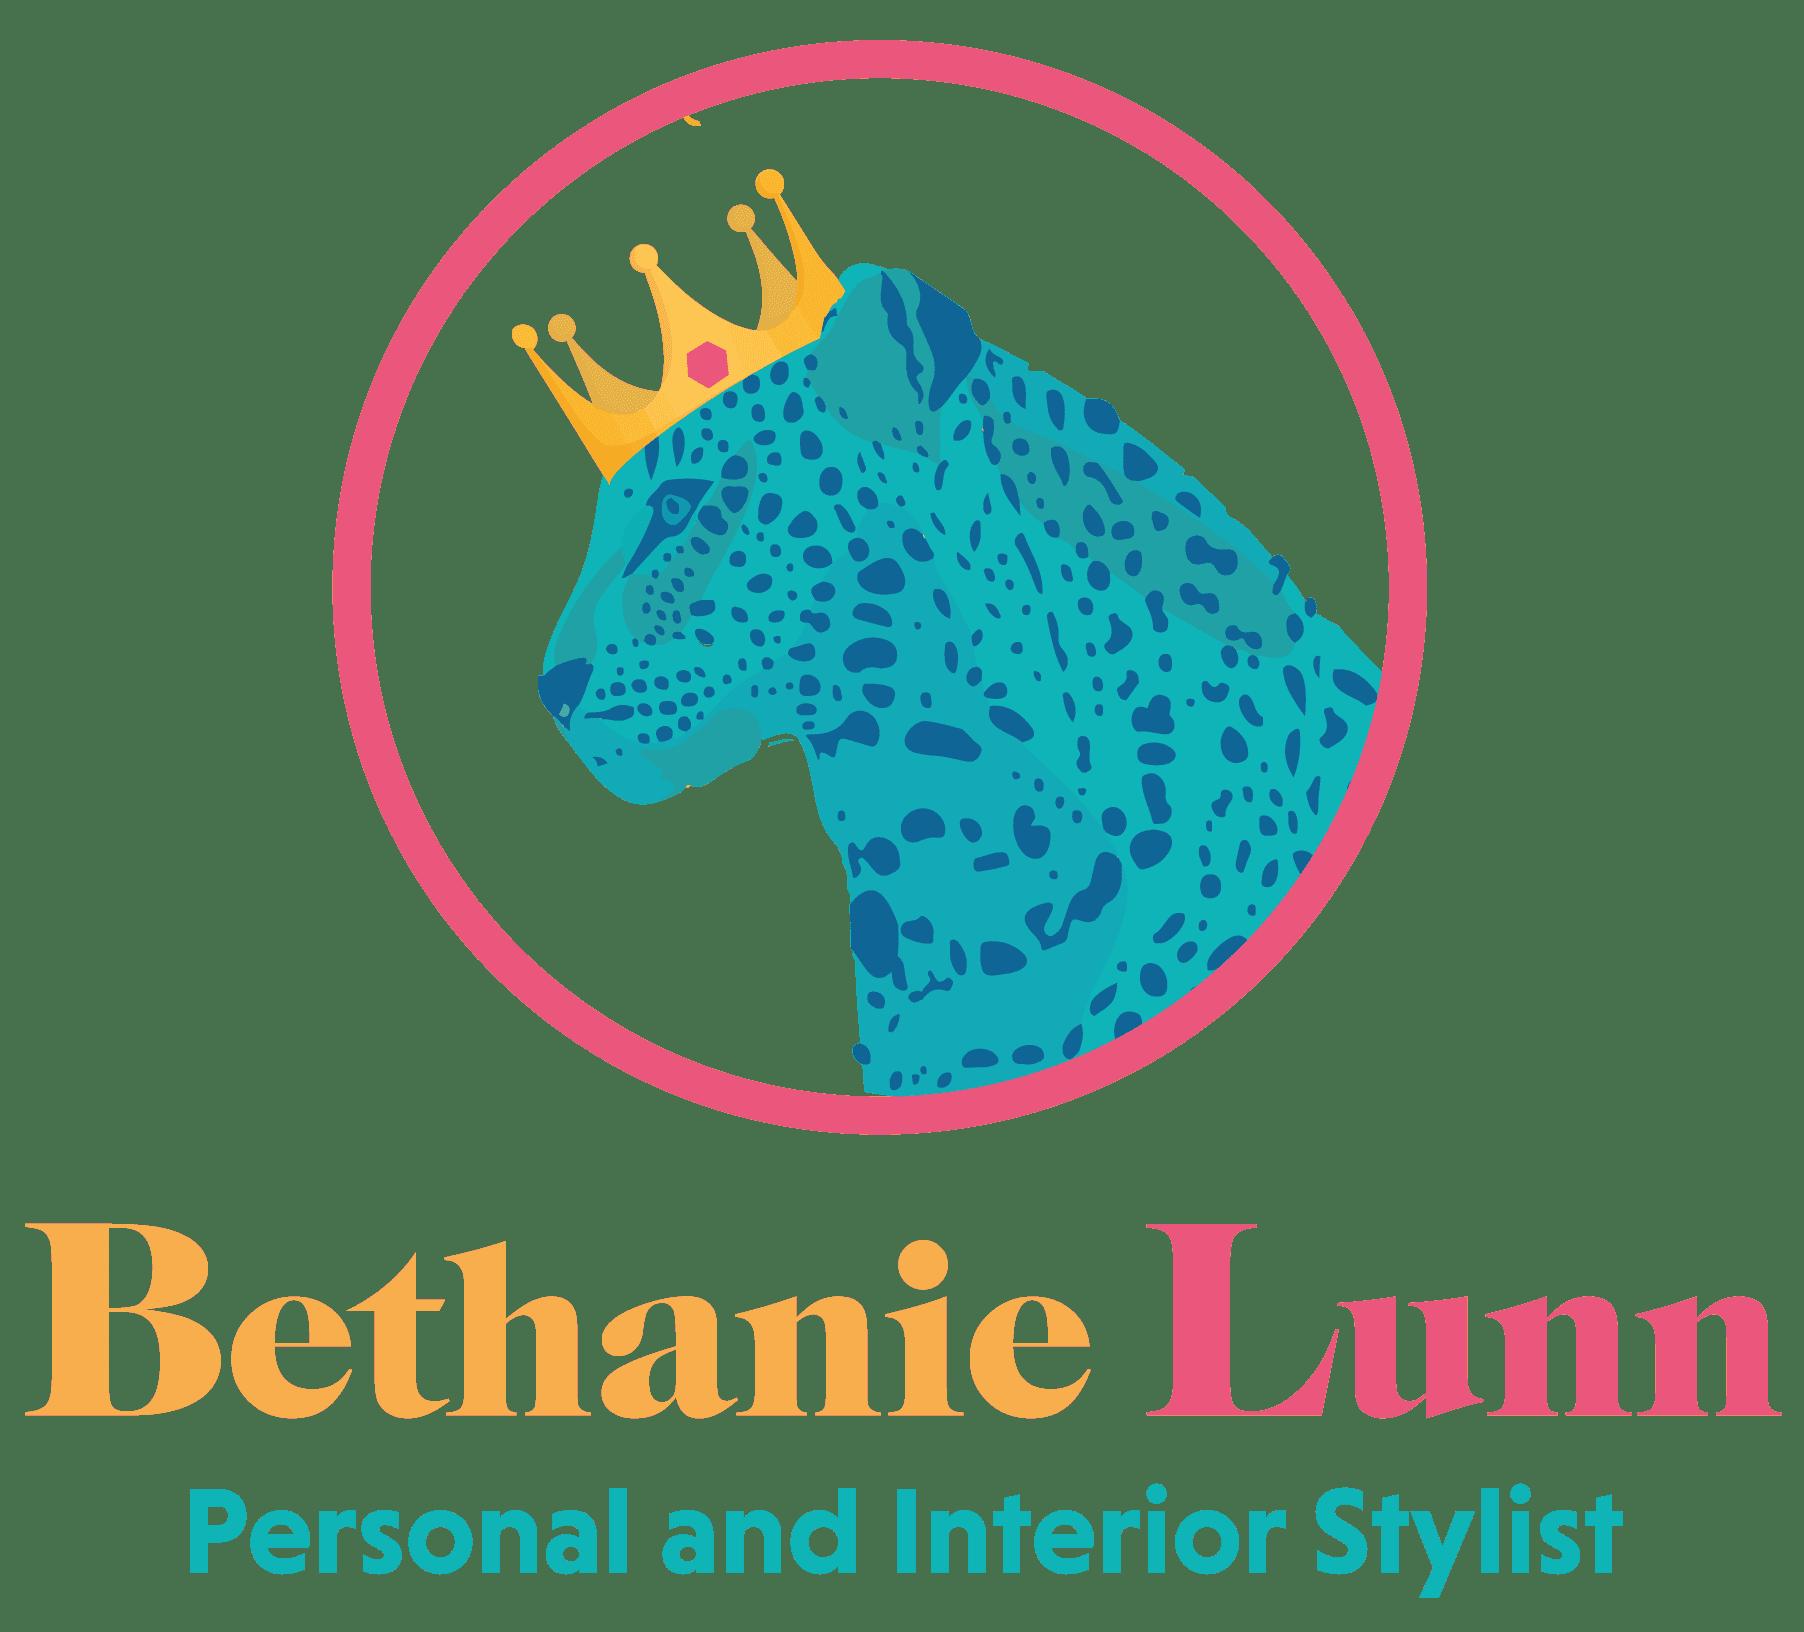 Bethanie Lunn